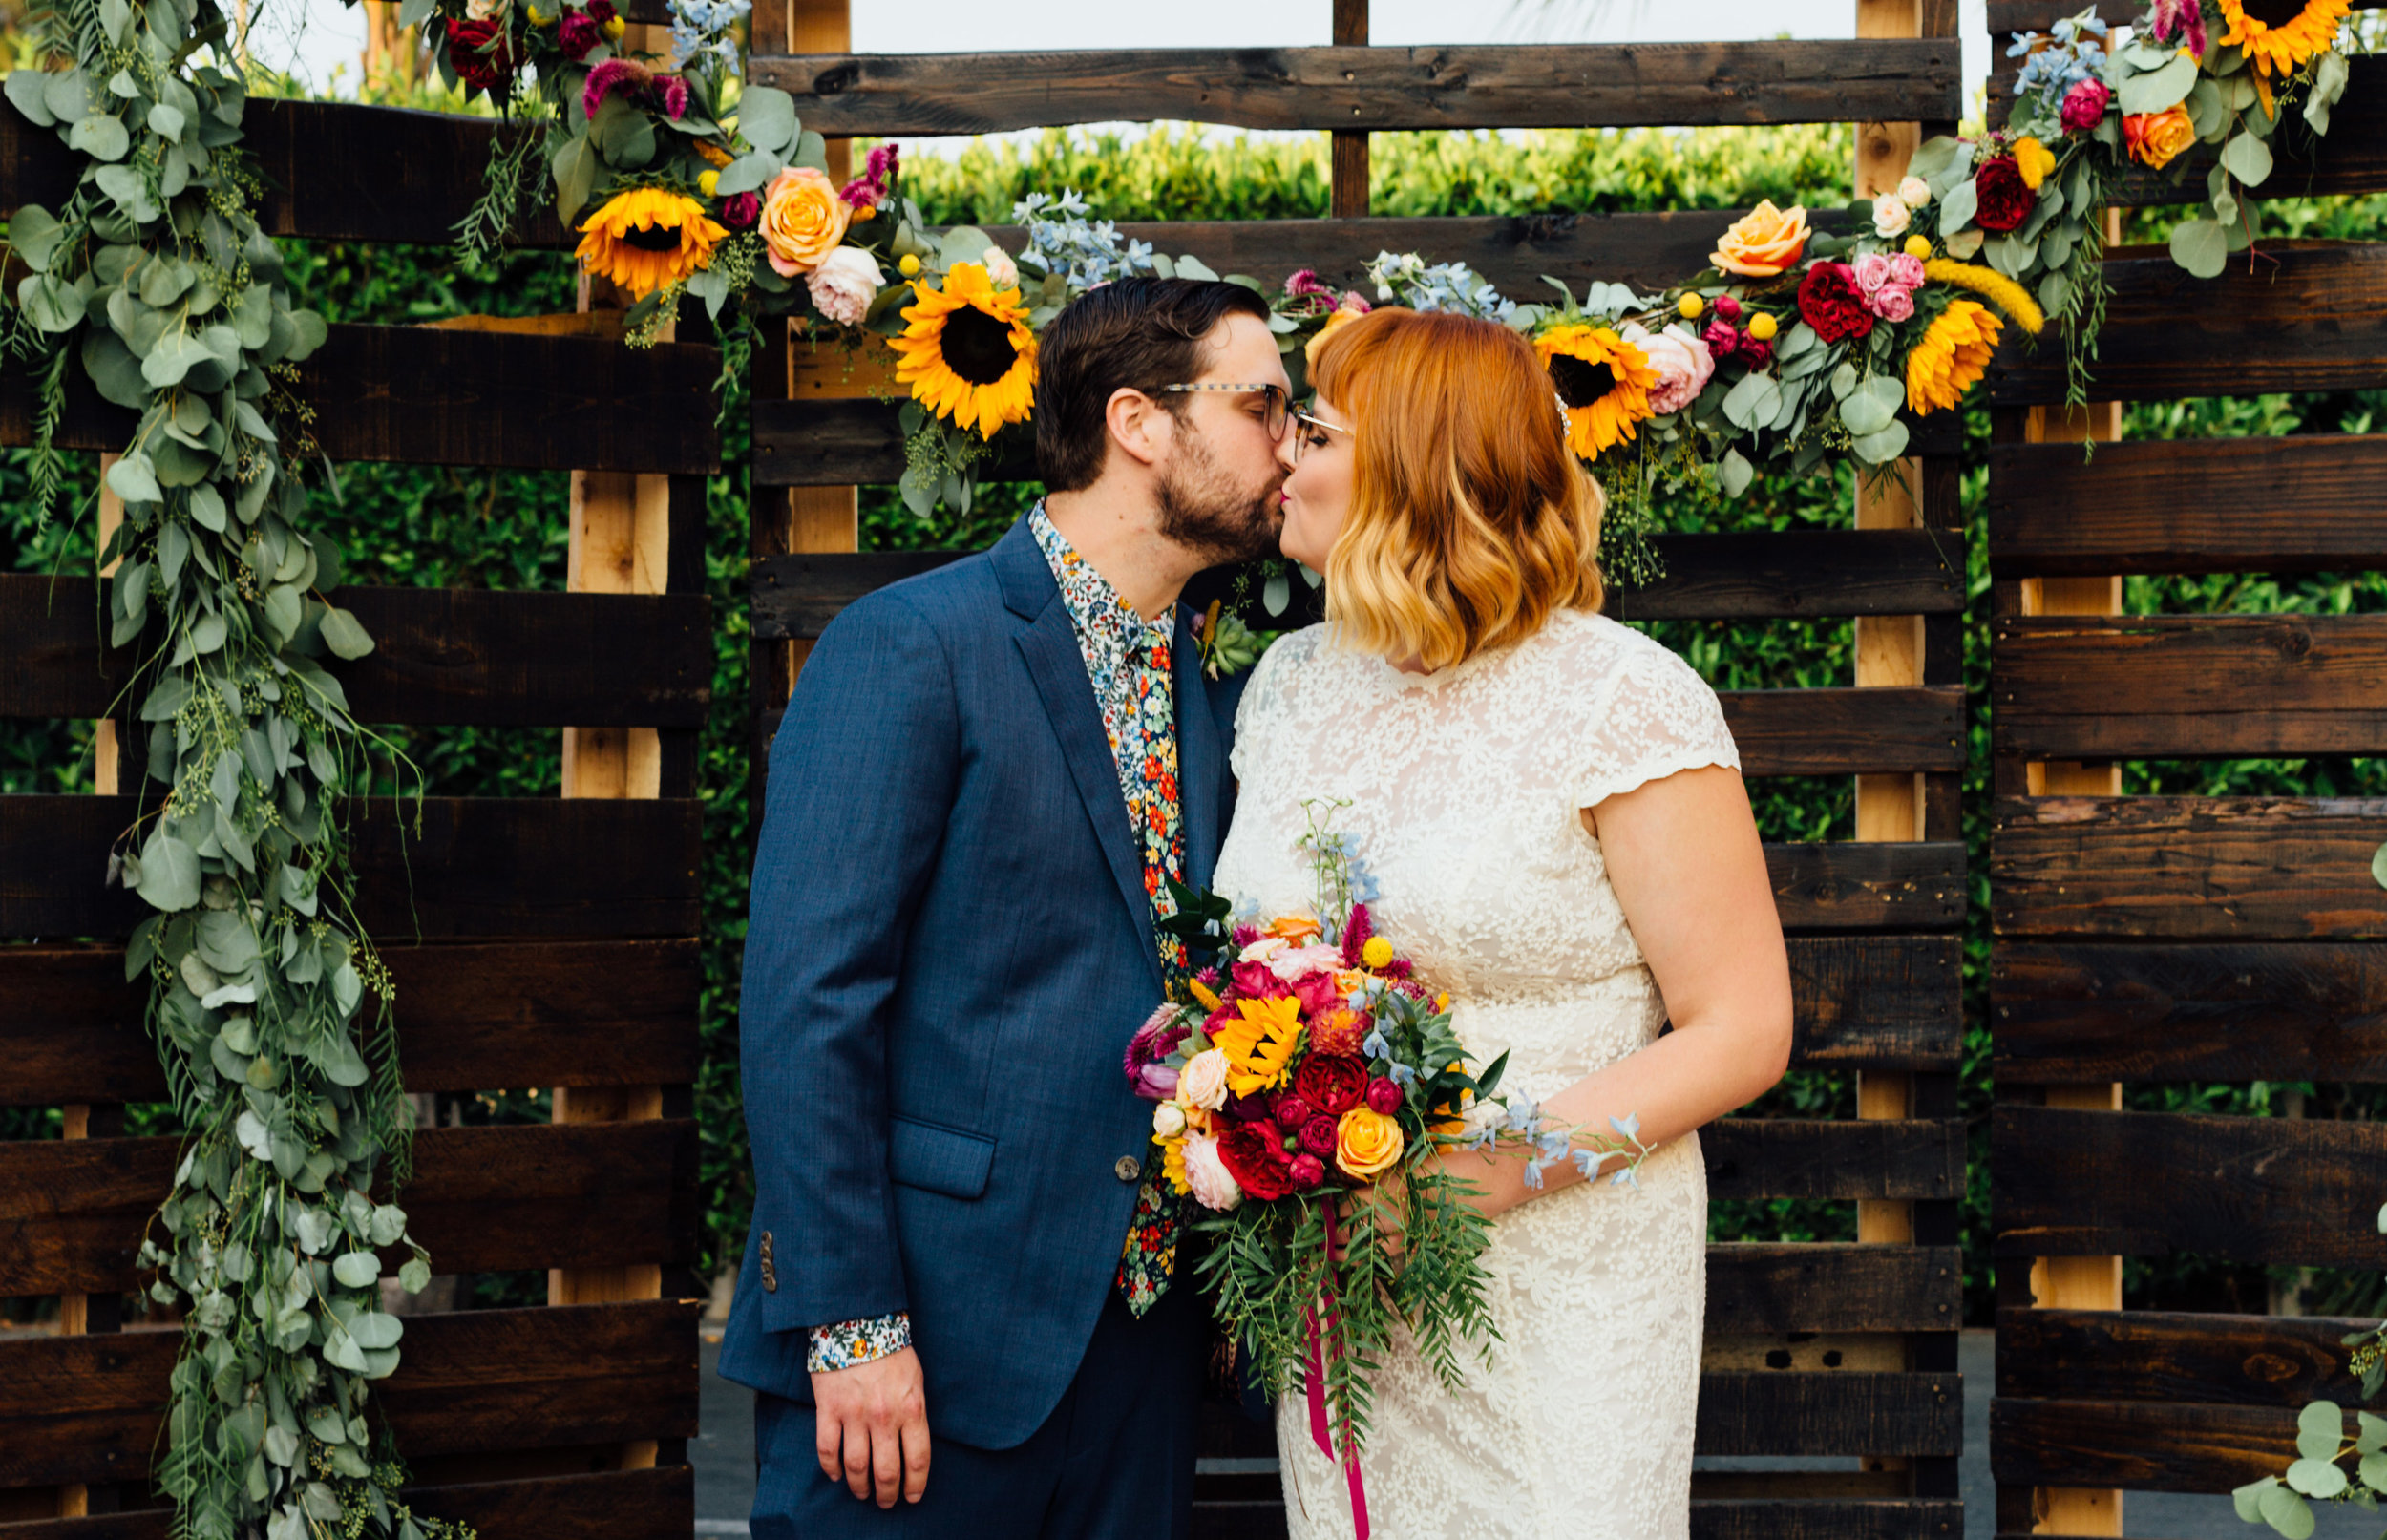 Sibyl_Sophia_Des_Moines_Iowa_Bright_Wedding_Florals_Ceremony.jpg